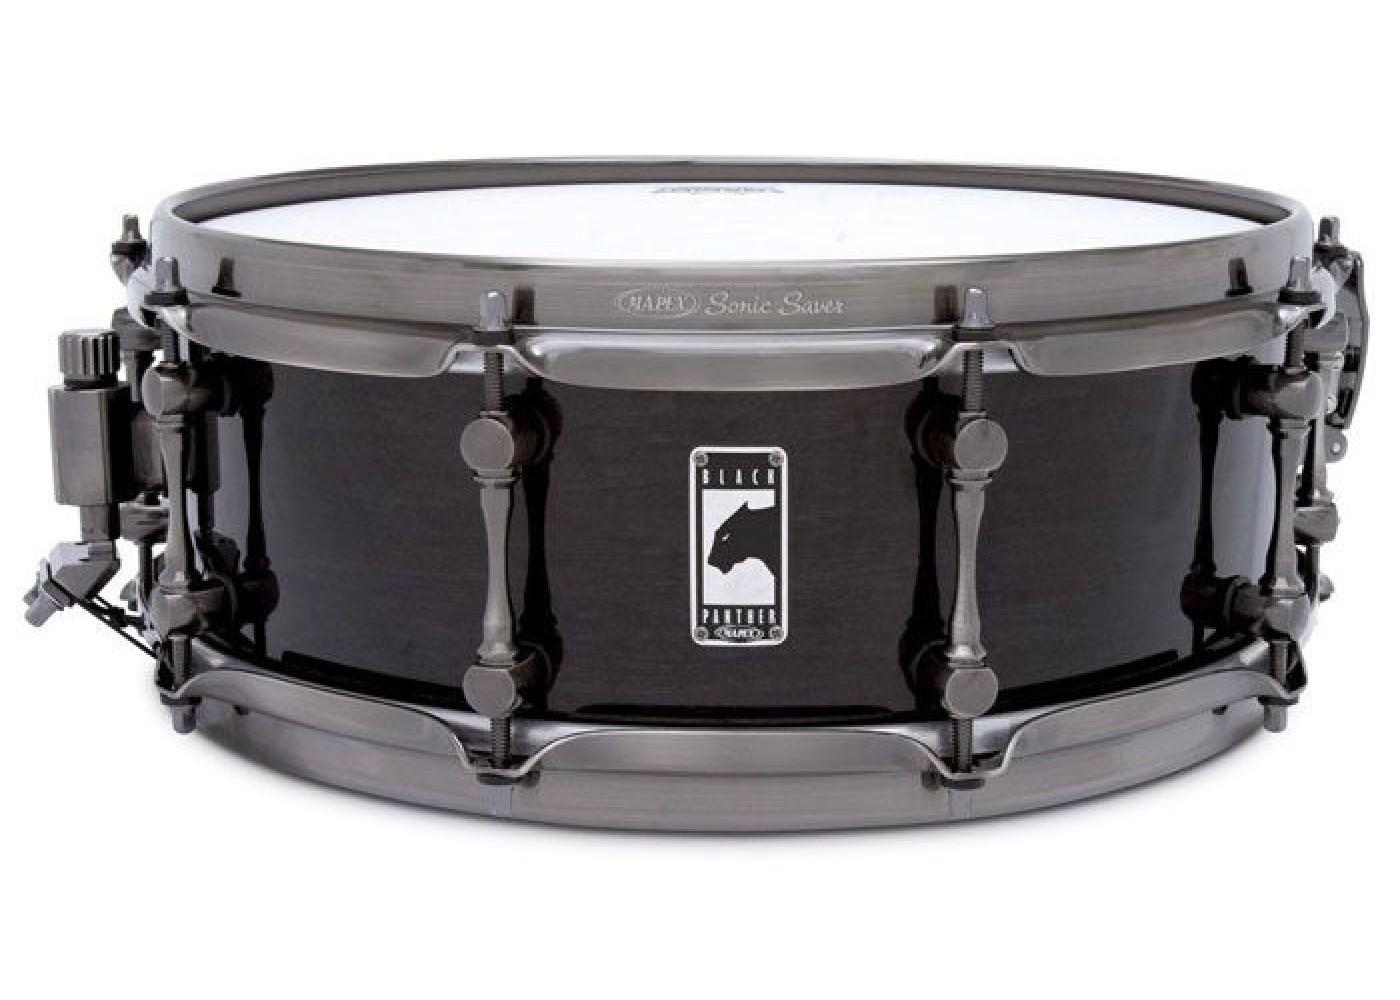 Black Panther Black Widow 14X5 Snare Drum: Drum Kit